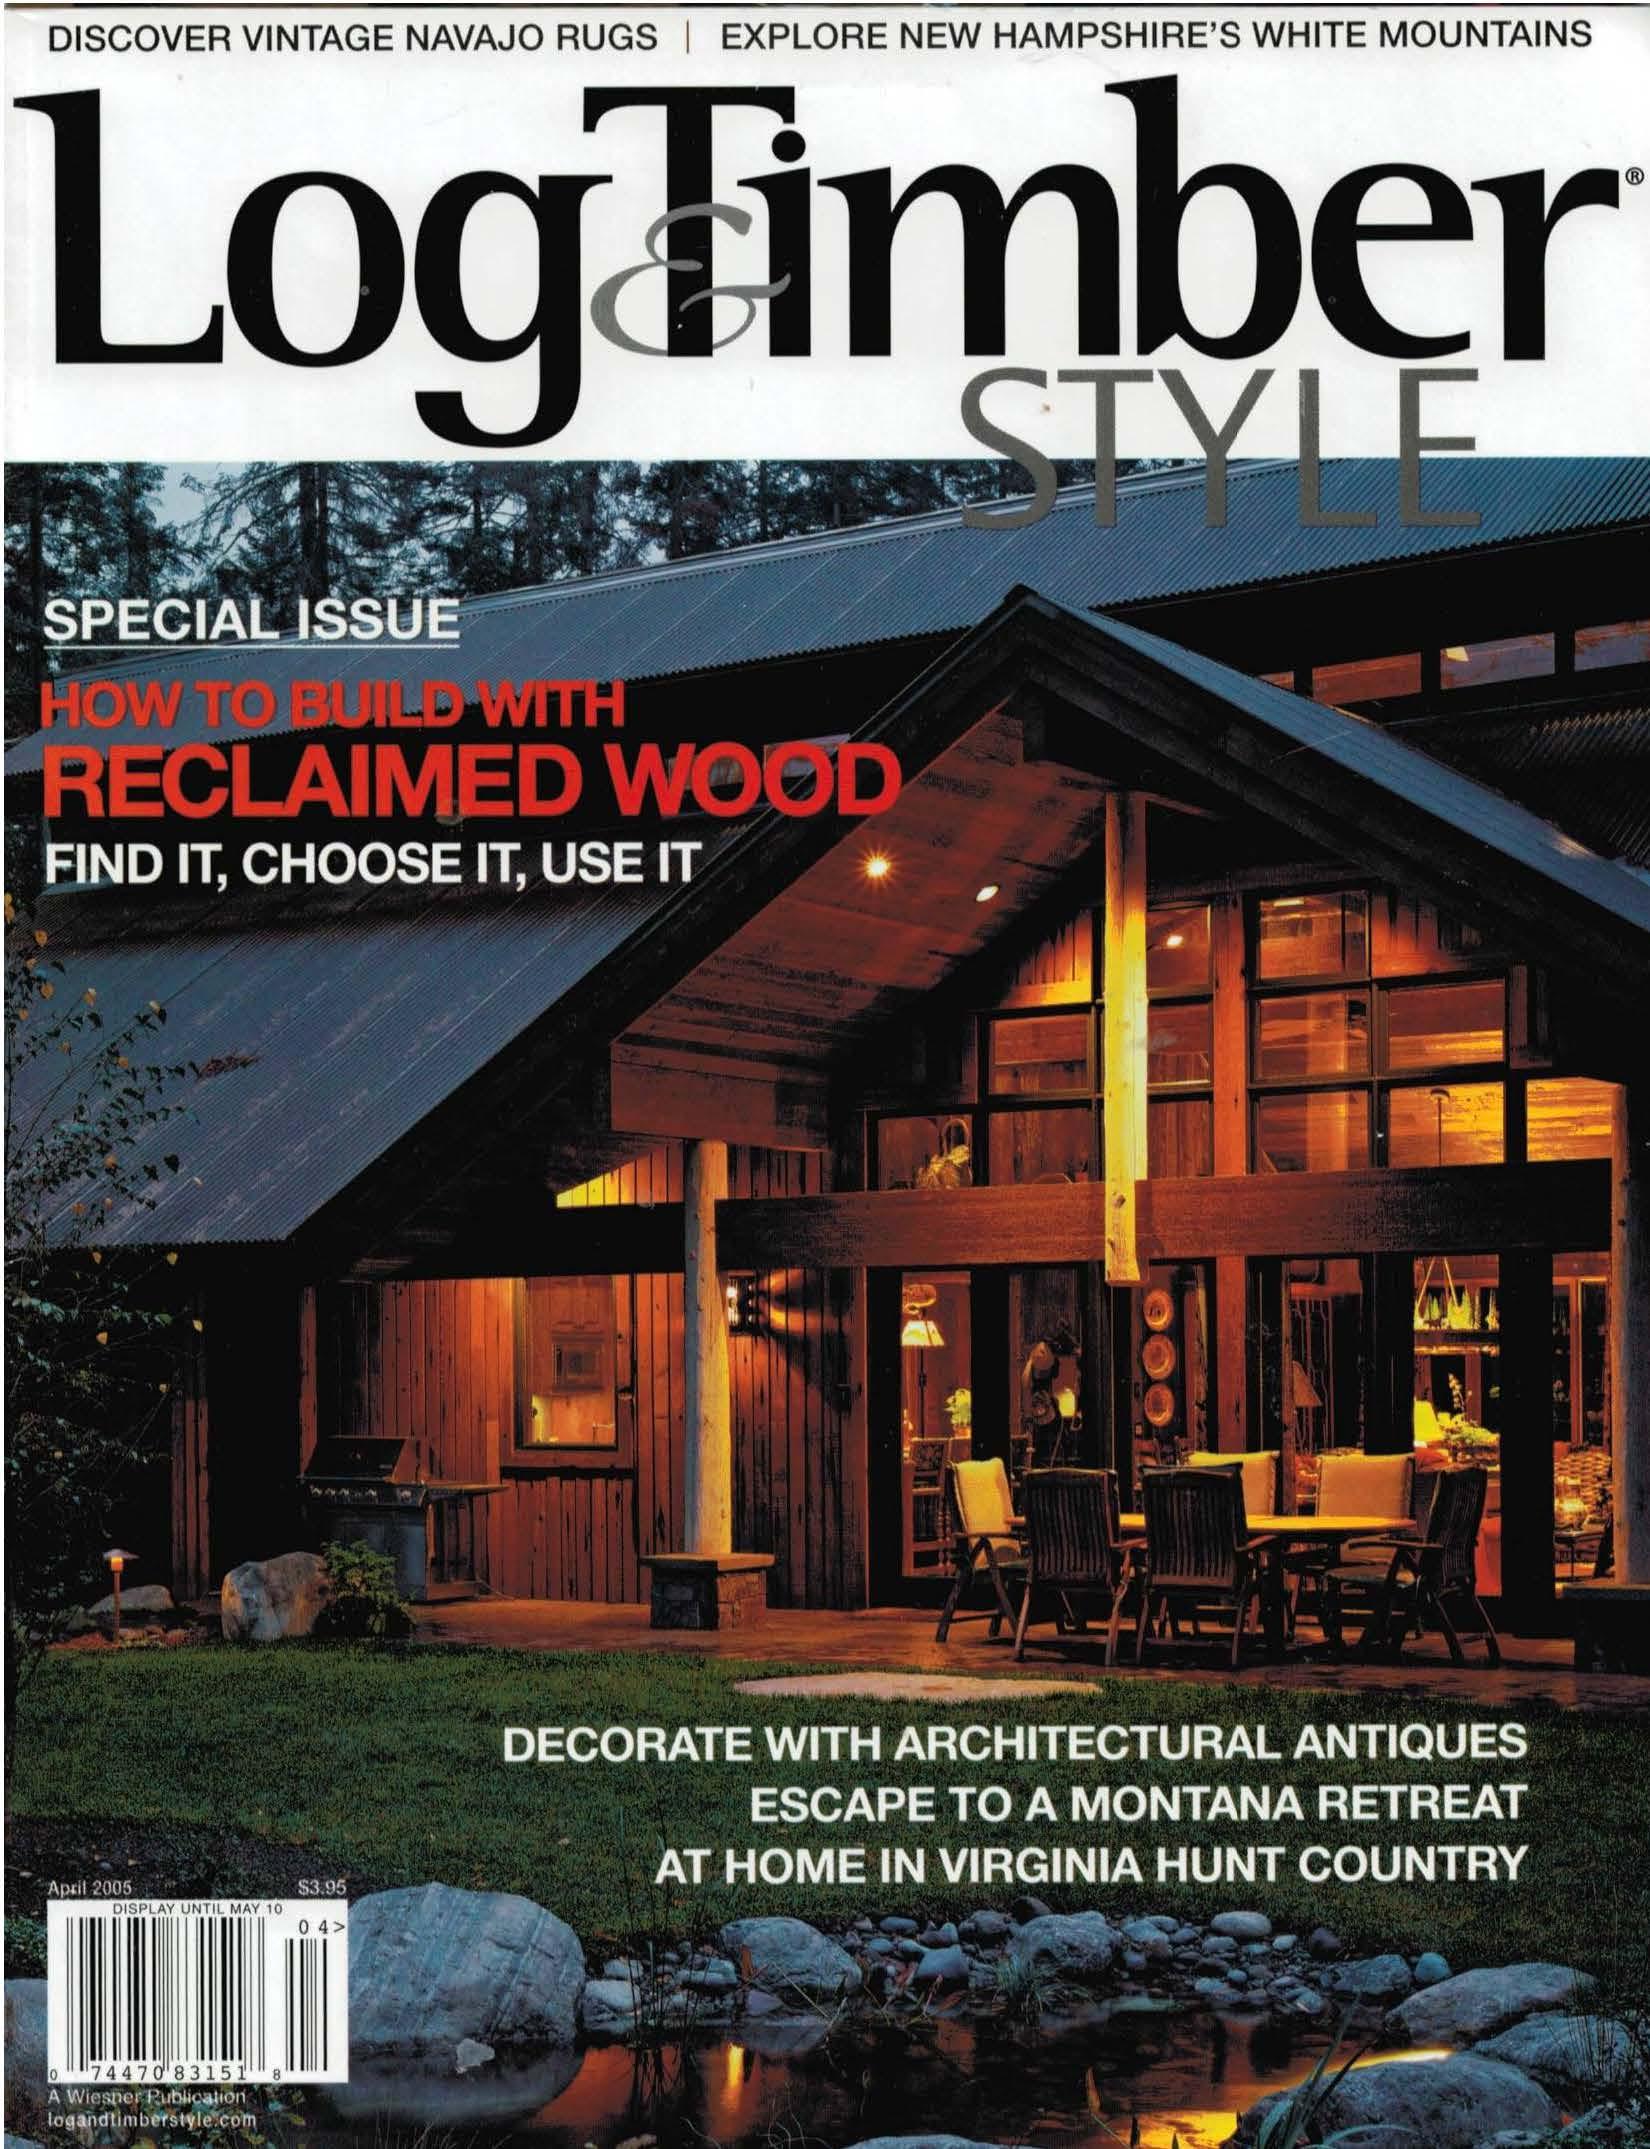 17 Log & Timber Style-April 2005.jpg